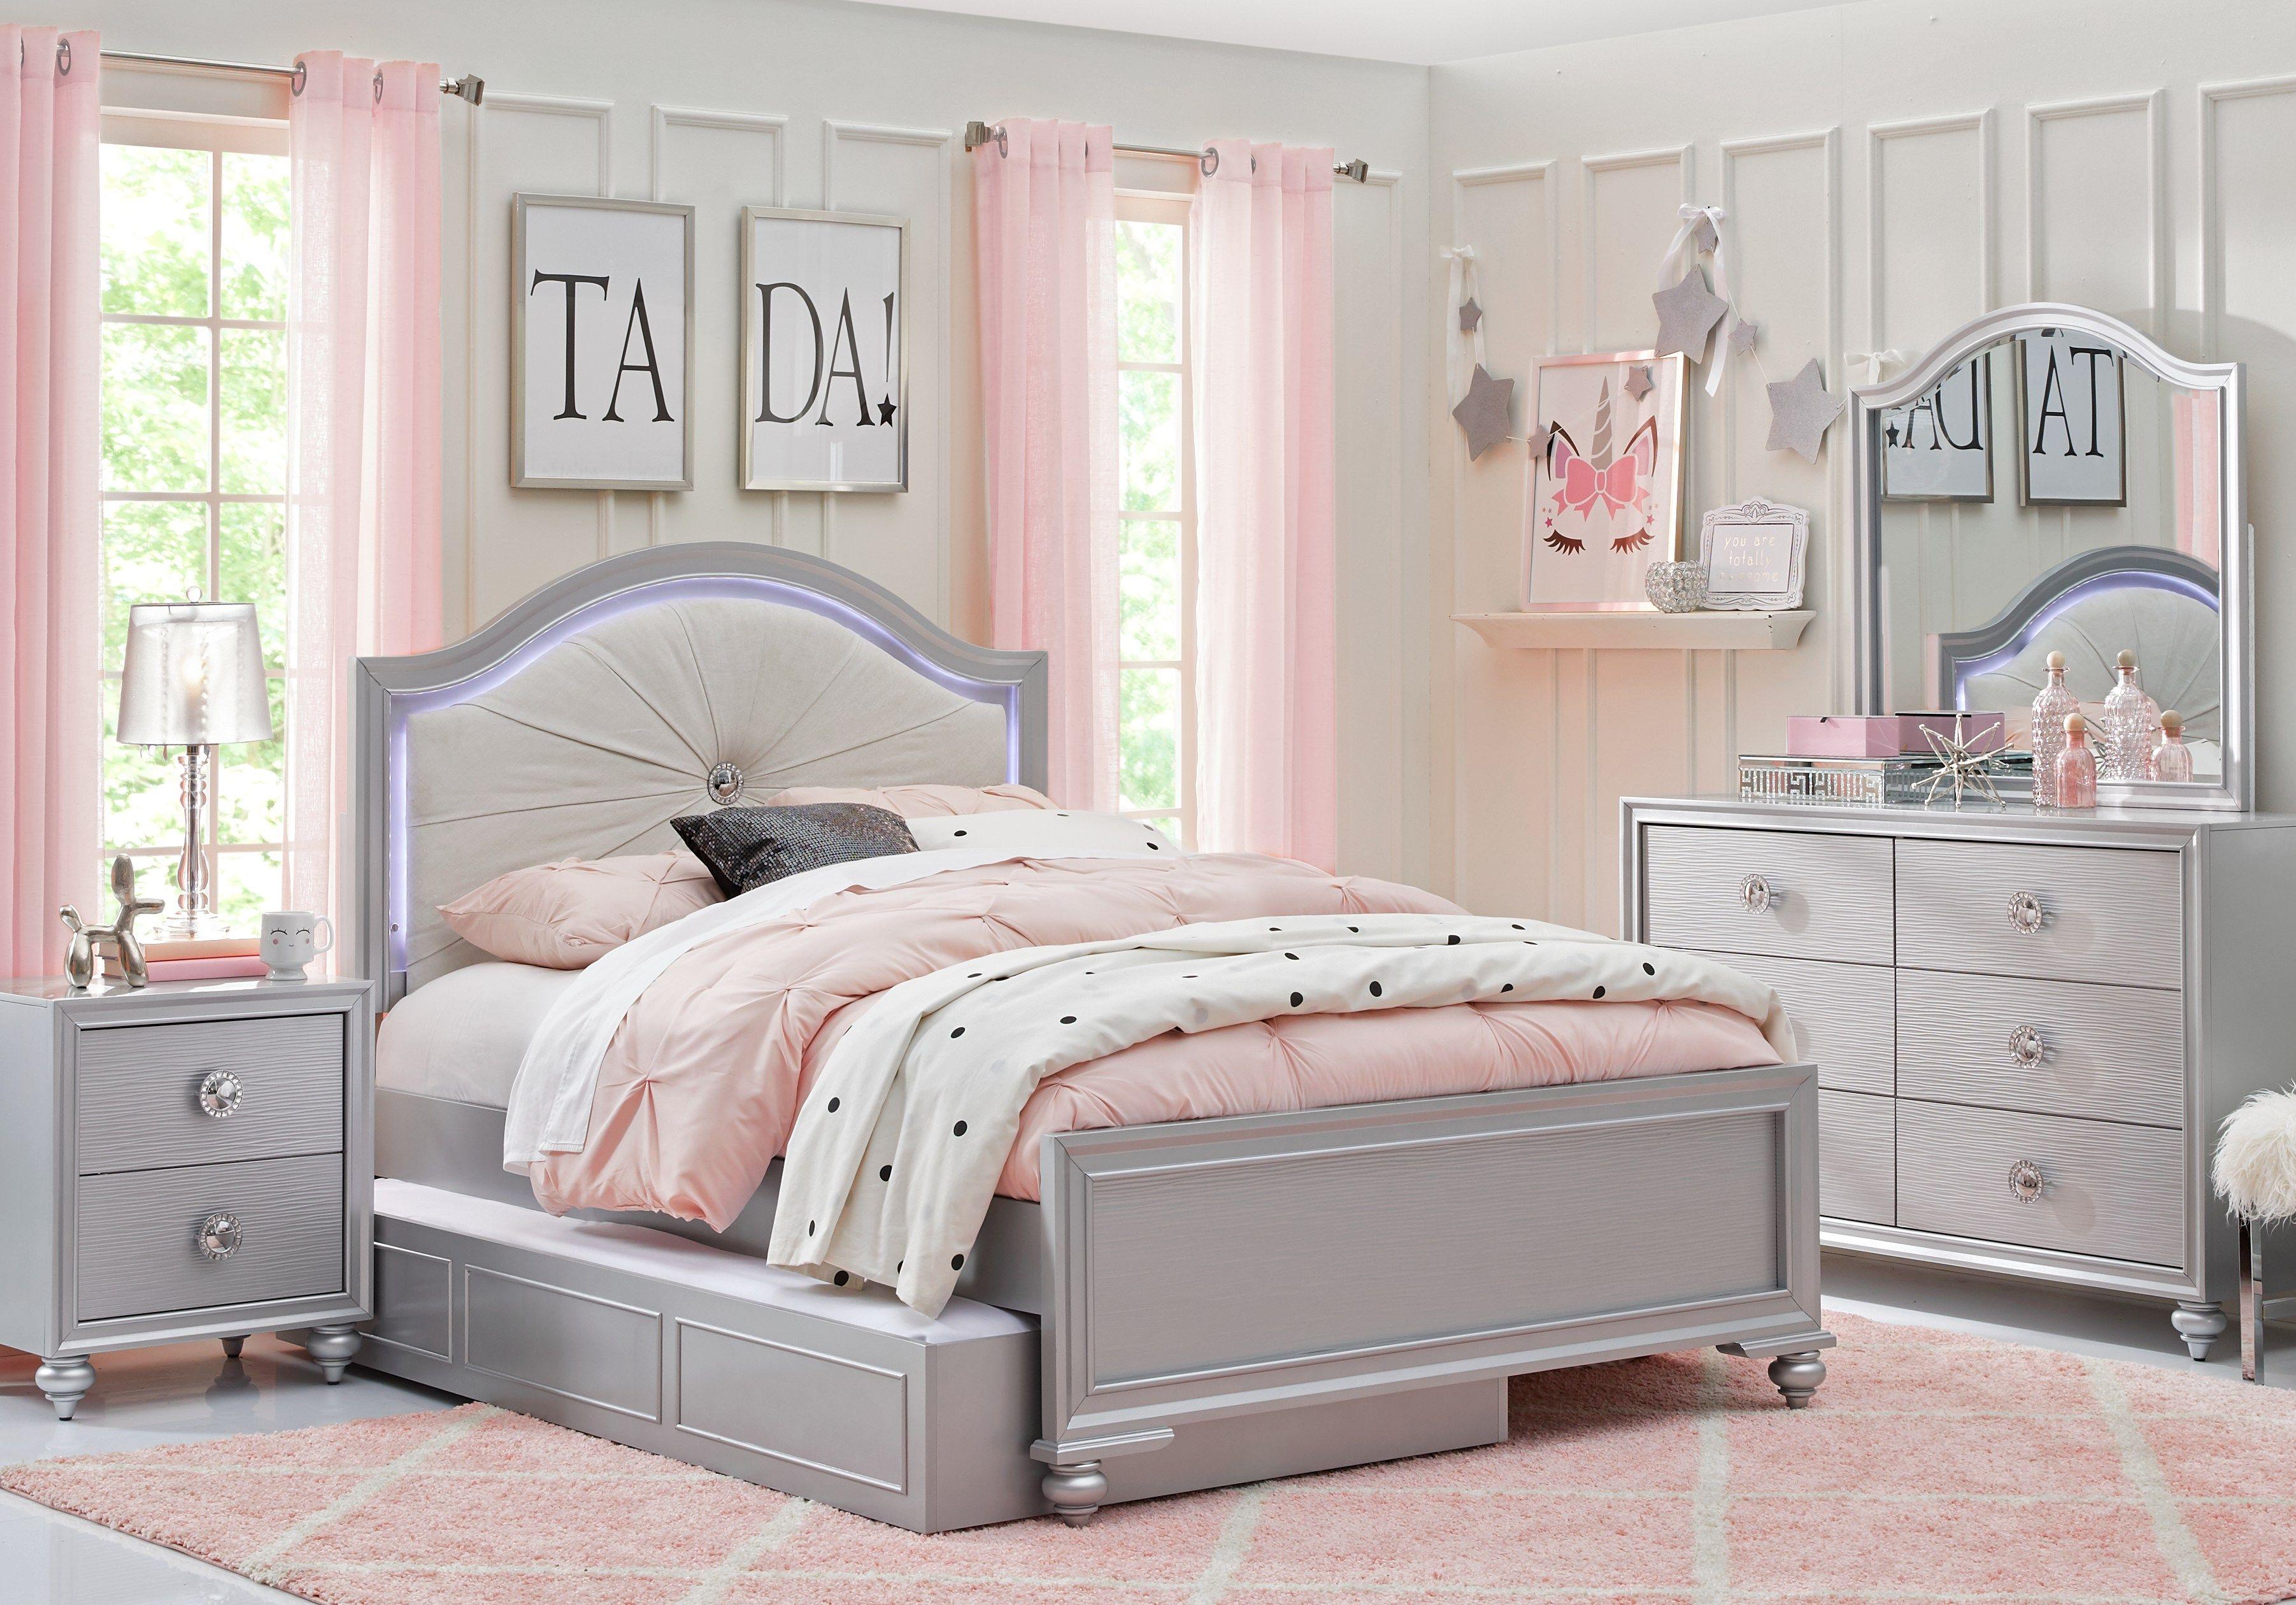 Evangeline Silver 4 Pc Full Panel Bedroom Girls Bedroom Sets